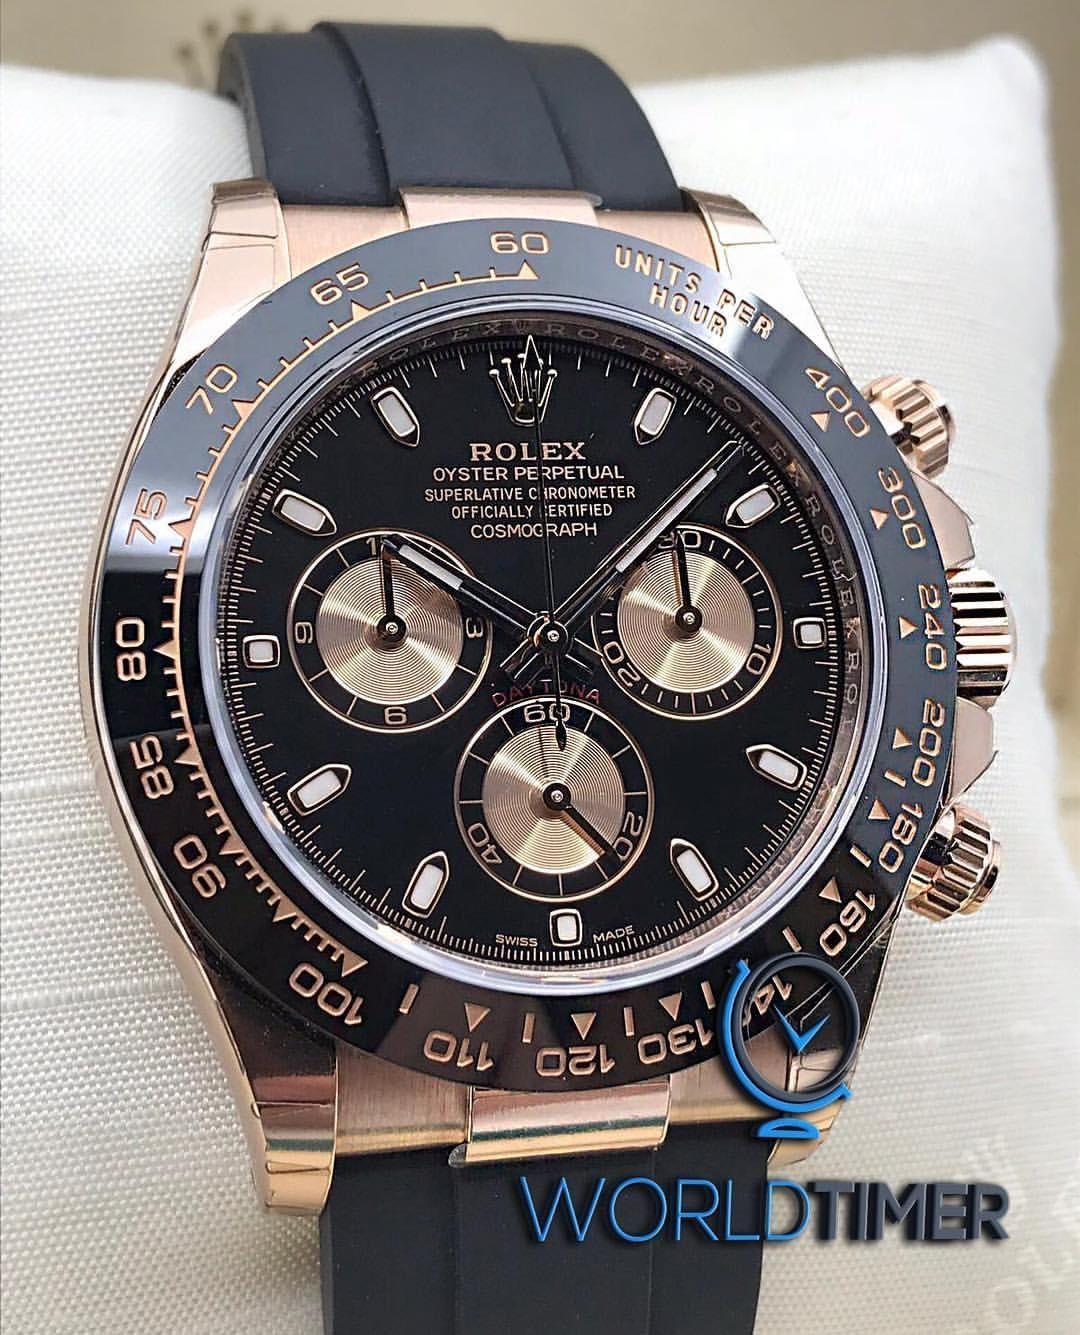 Rolex New Rose Gold Daytona 116515ln Black Dial 40mm Mens Watch Selling Price 售價 Hk 235 000 Rolexforum Rolexaholics Rolexwatch Rolexcollector Rolexlov In 2020